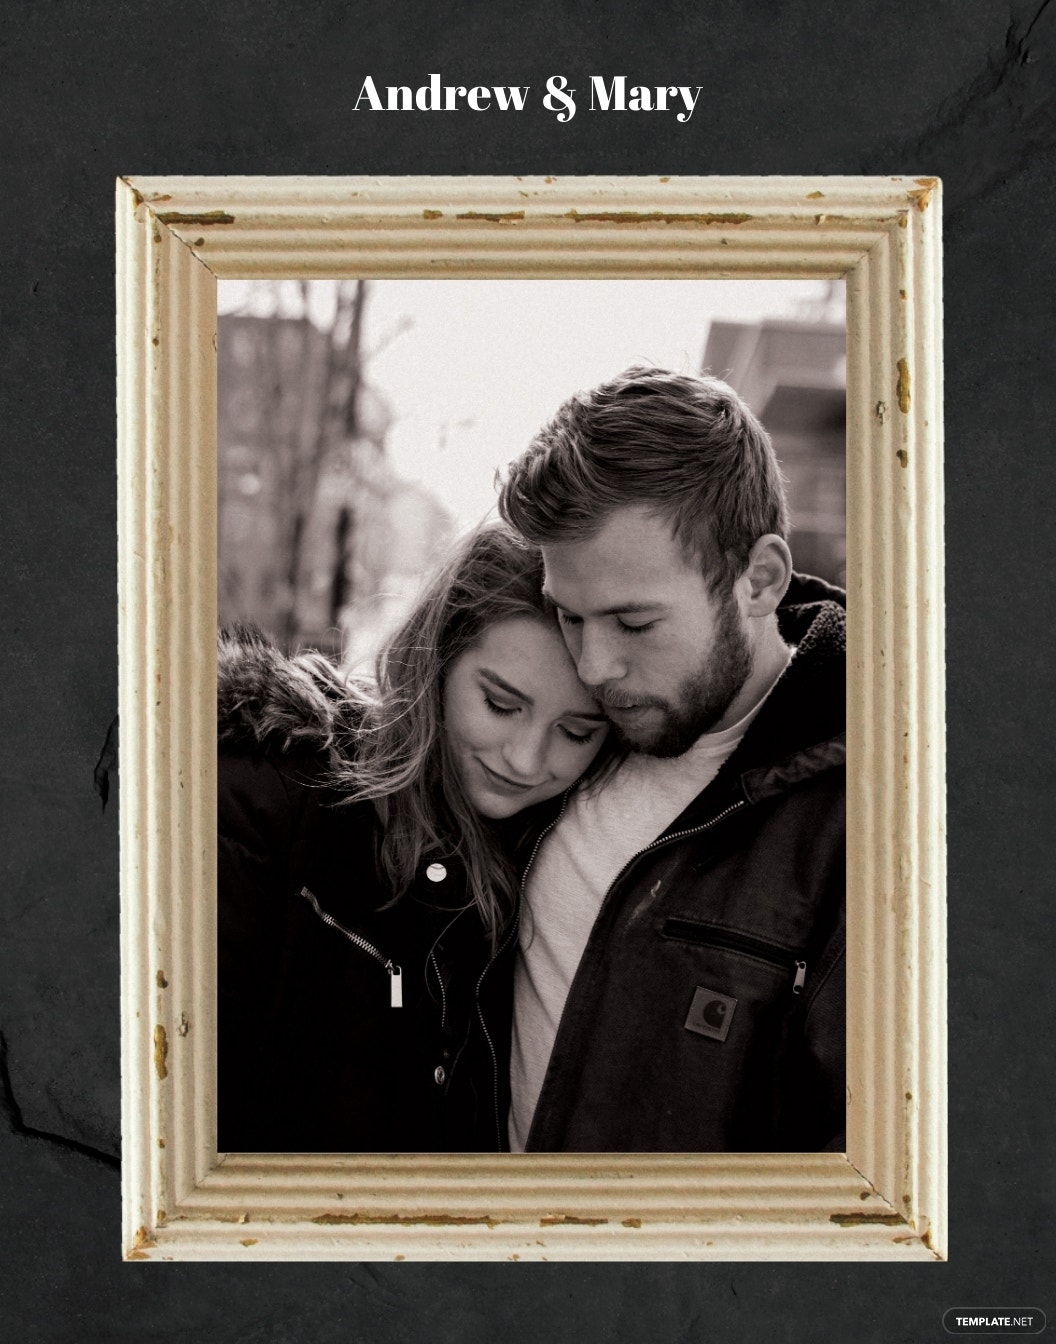 Vintage Photo Frame Template